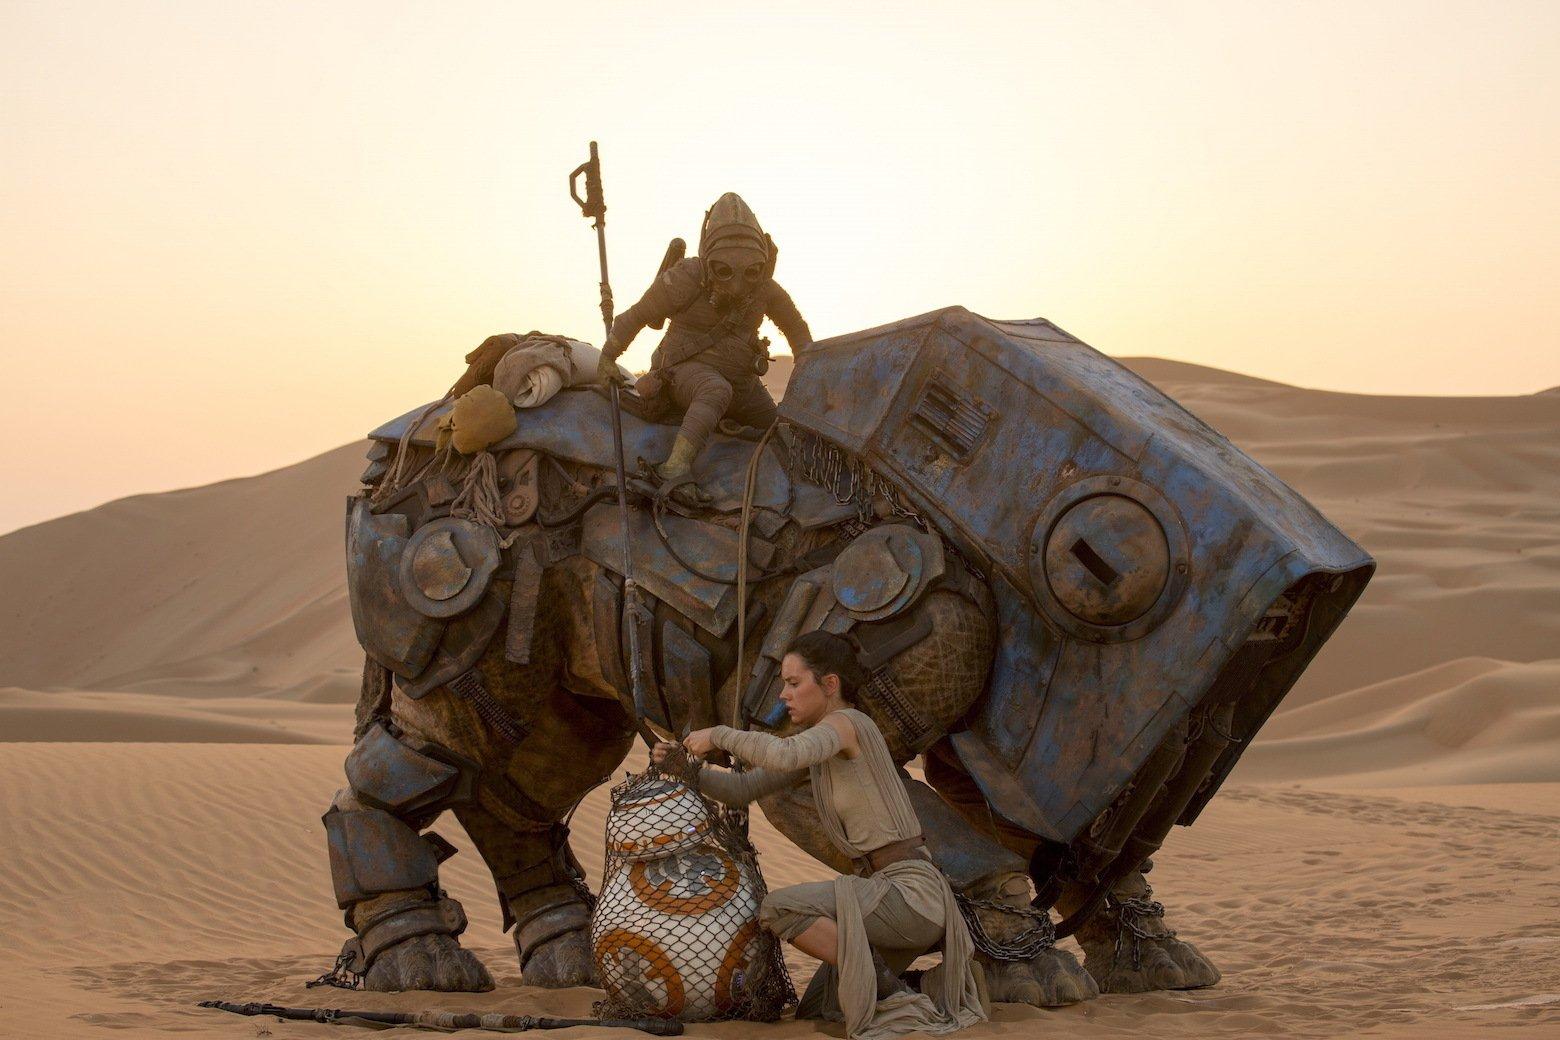 Star Wars VII The Force Awakens 15 - Rey and BB-8 with scavanger Teedo